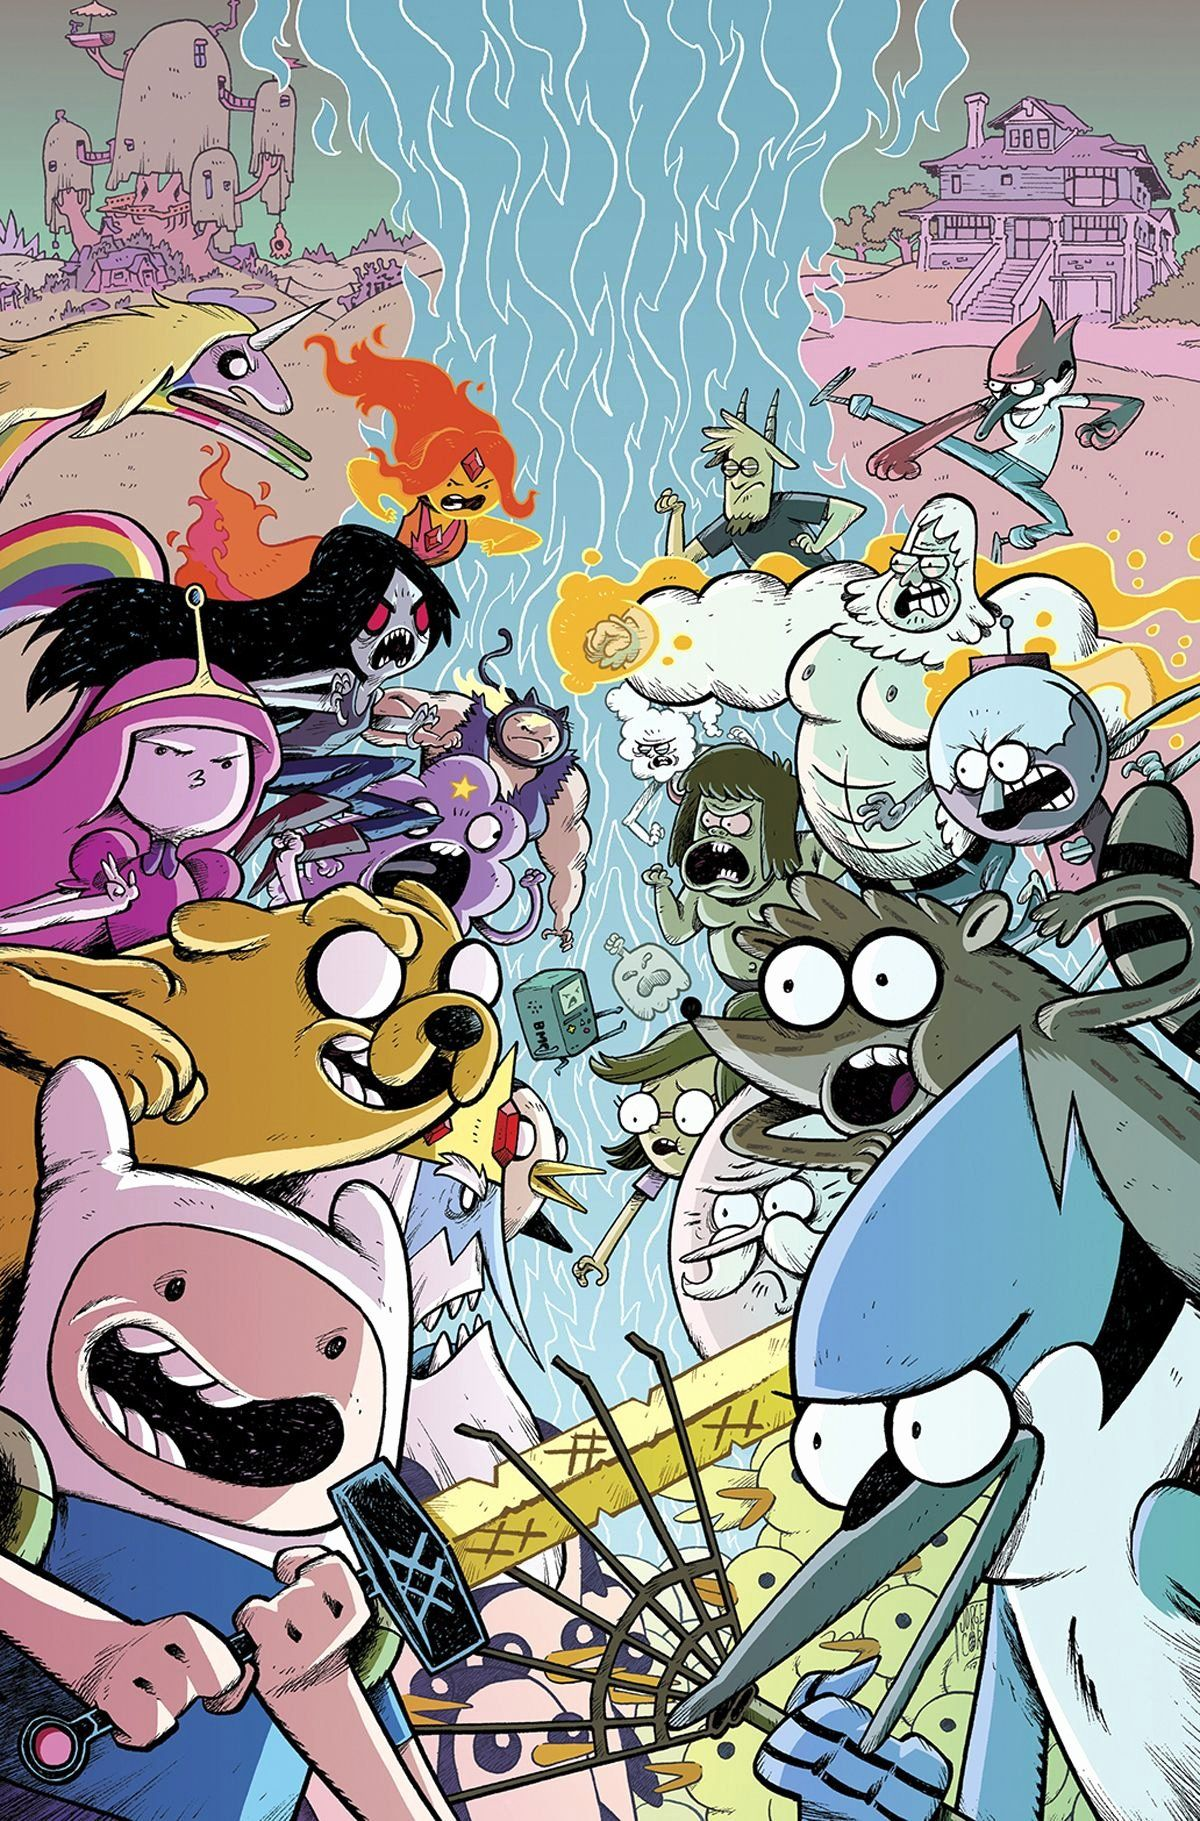 Adventure Time Episodes Wallpaper Elegant Adventure Time Regular Show 1 Subscription Corona Var ...